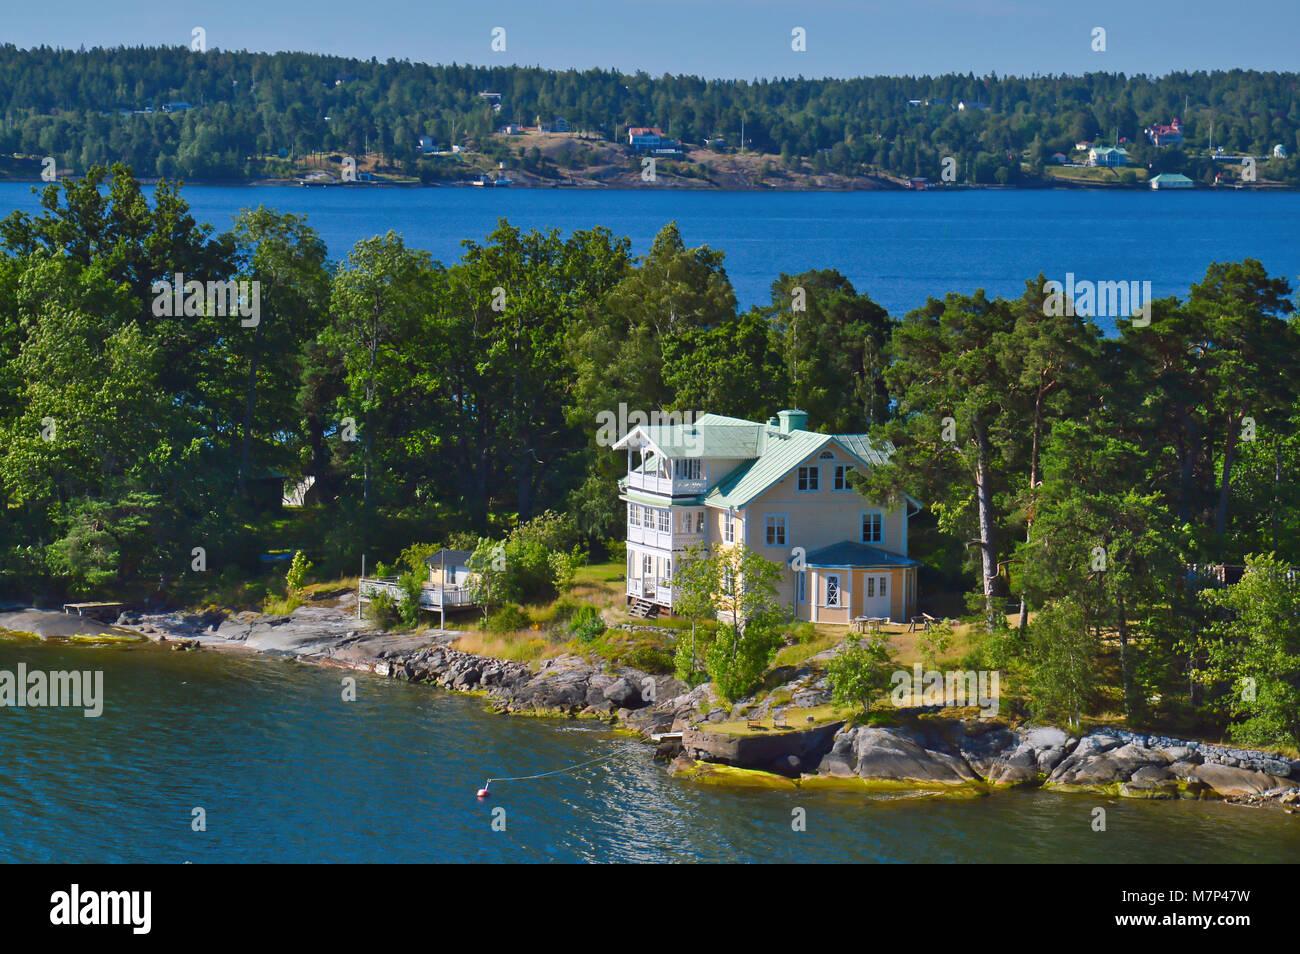 Swedish settlements on islets of Stockholm Archipelago in Baltic Sea, Sweden - Stock Image